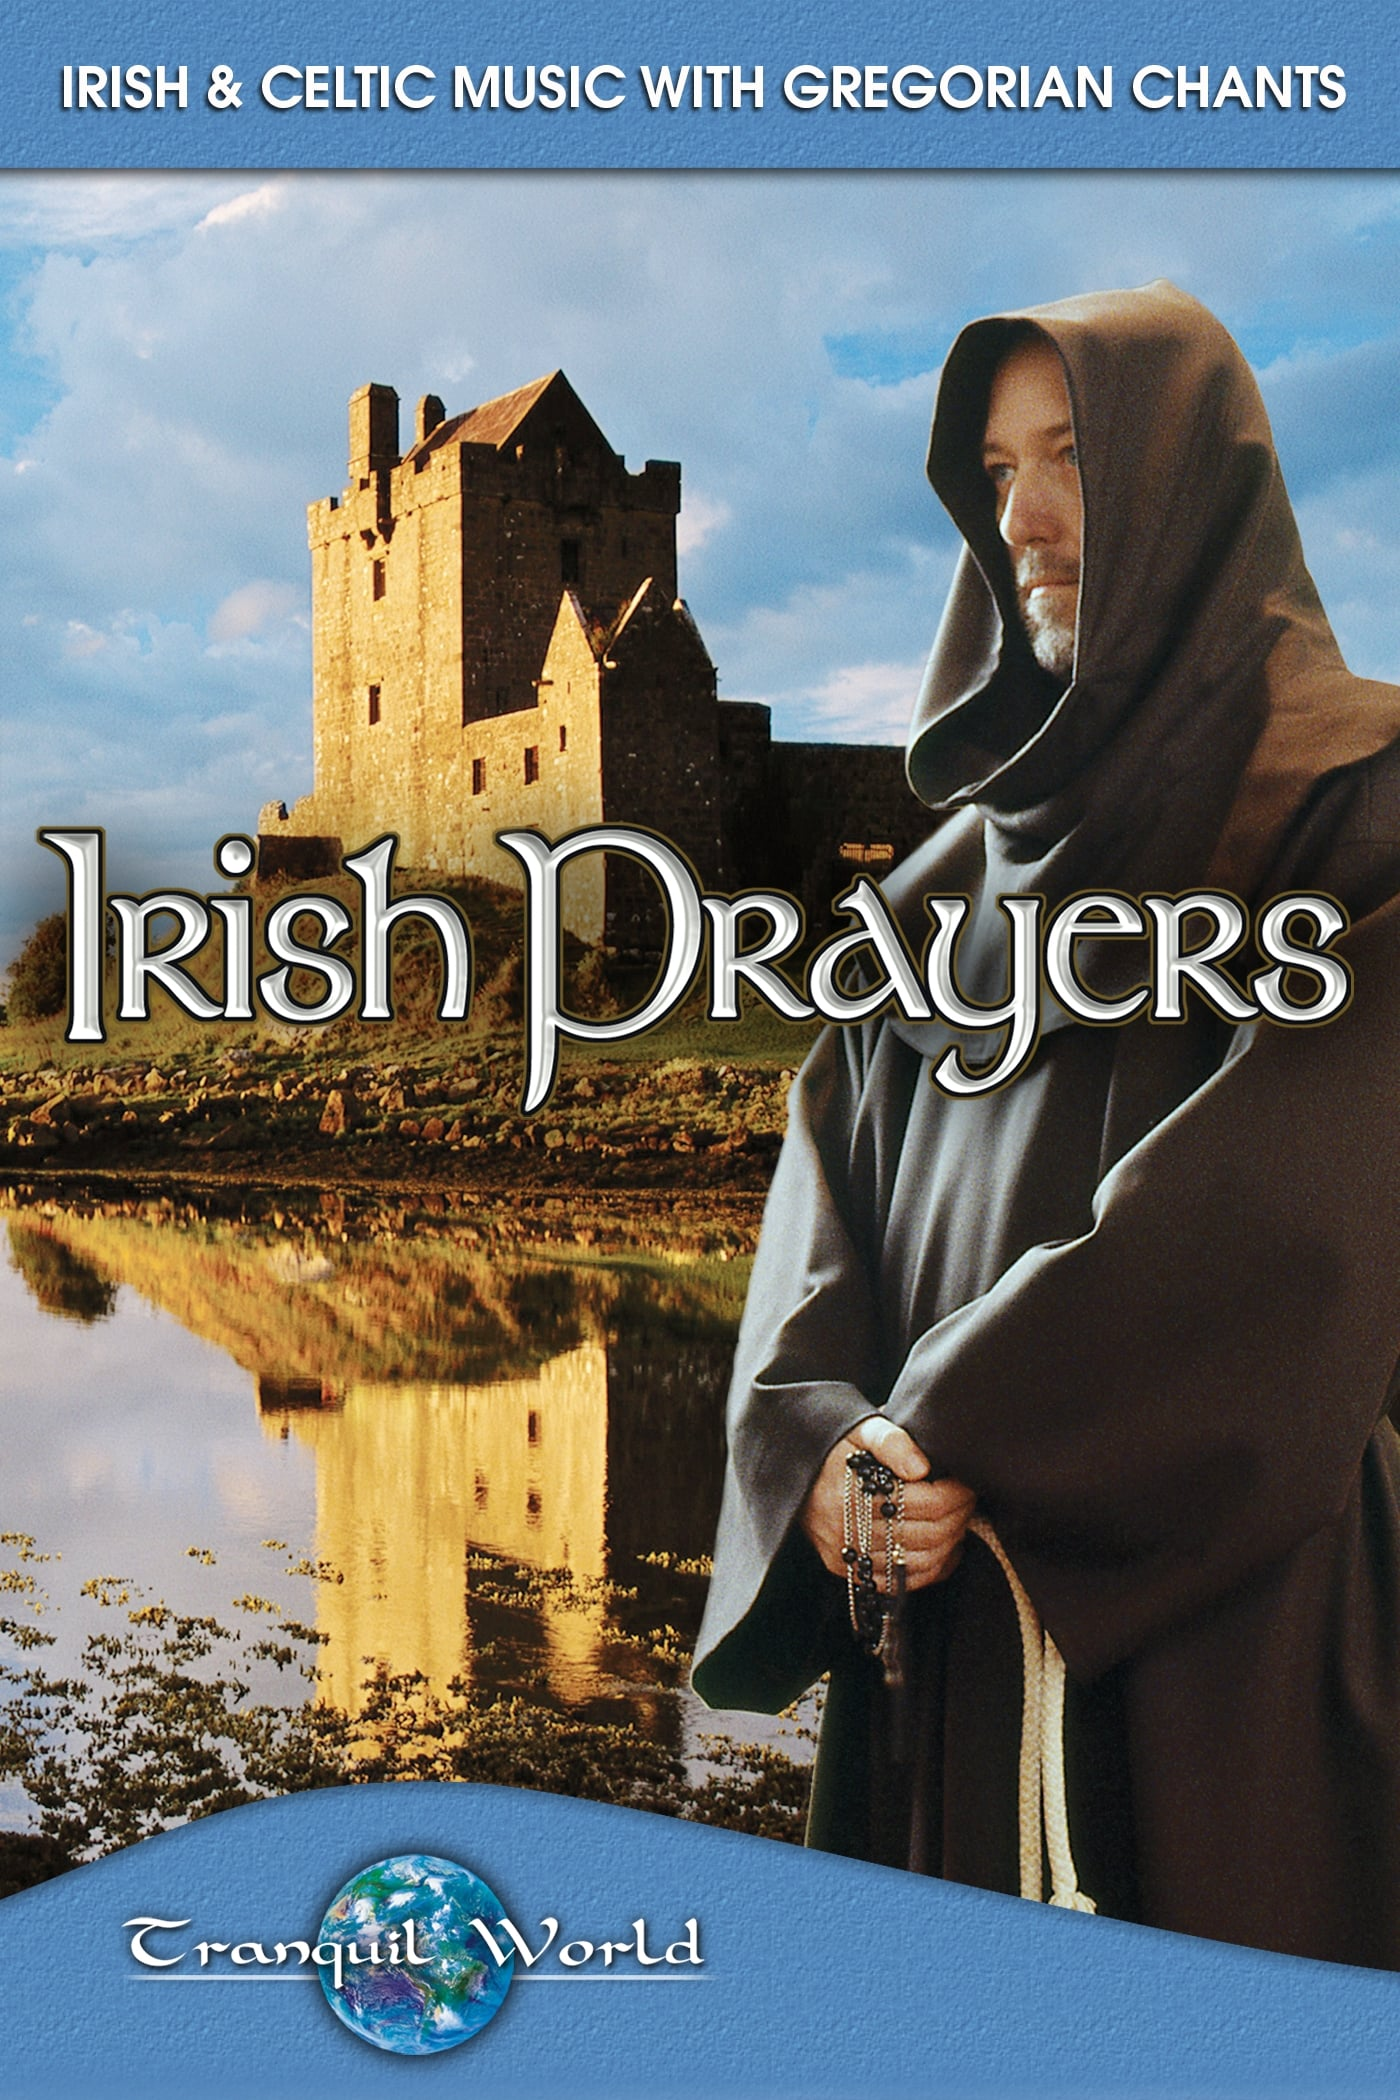 Irish Prayers: Tranquil World - Irish & Celtic Music with Gregorian Chants on FREECABLE TV